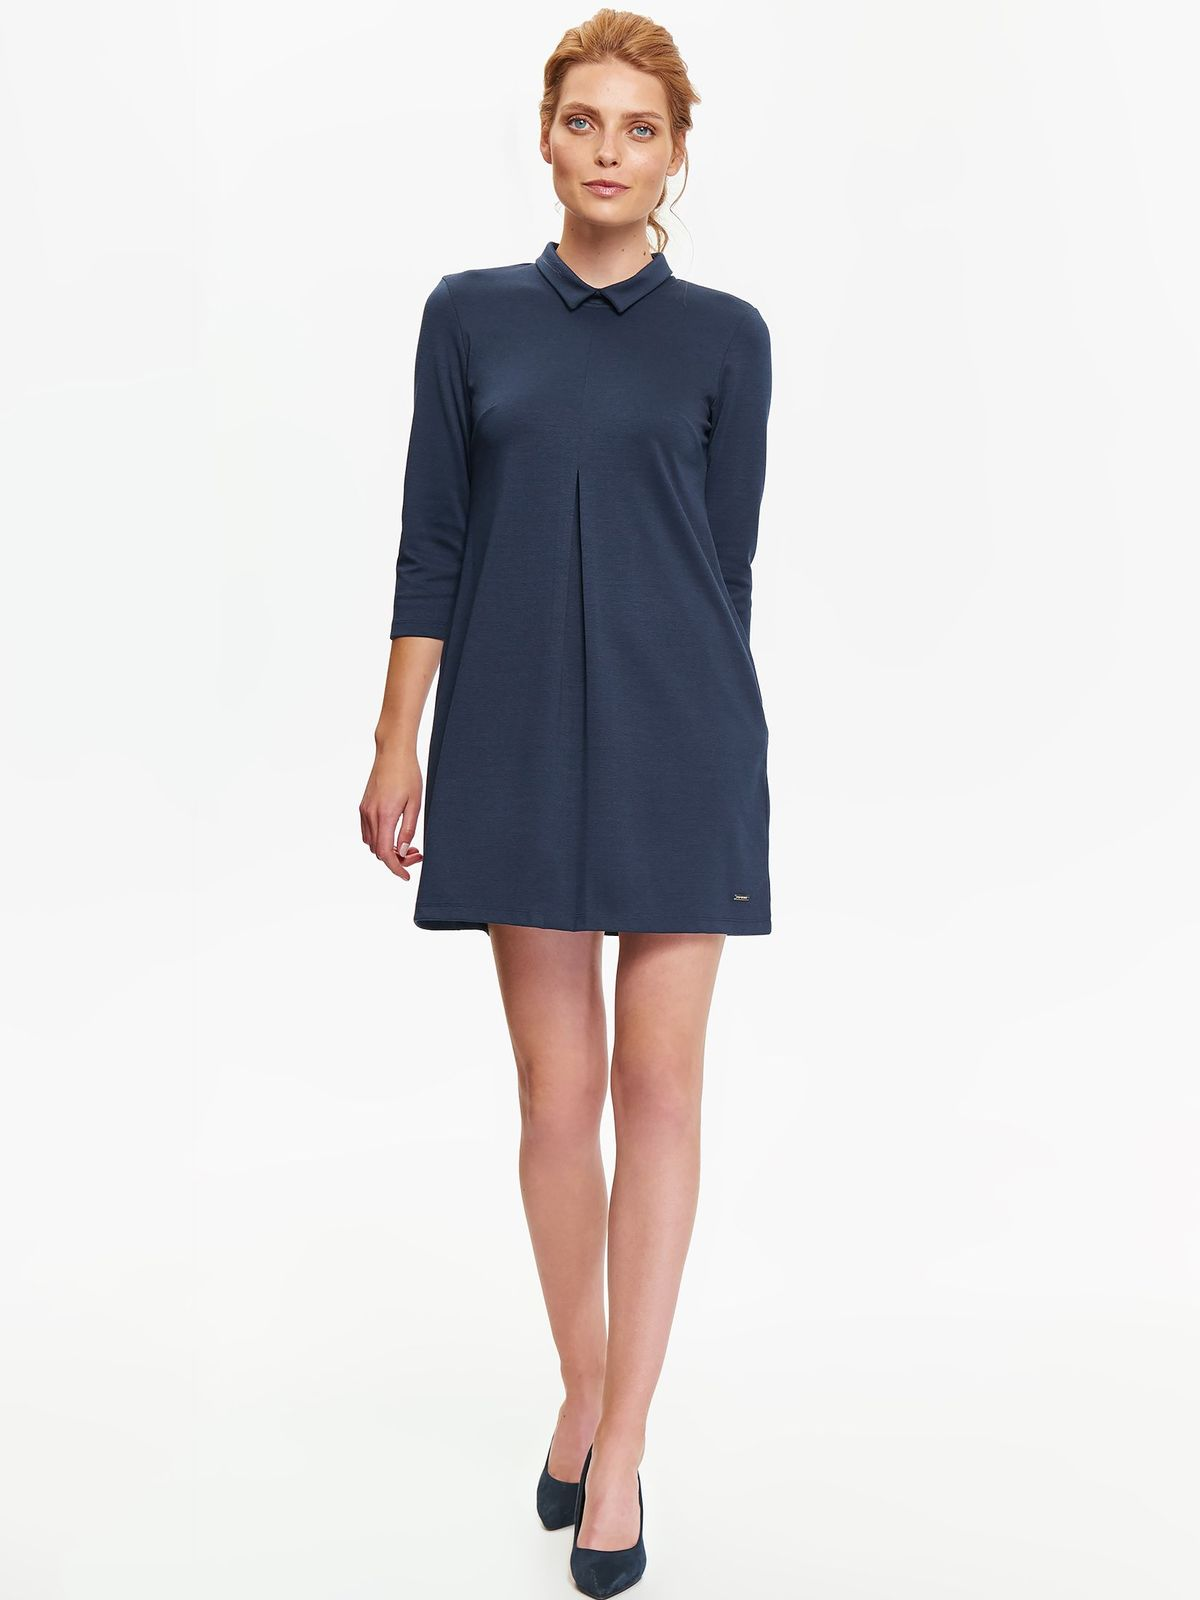 top secret κομψο φορεμα με γιακα